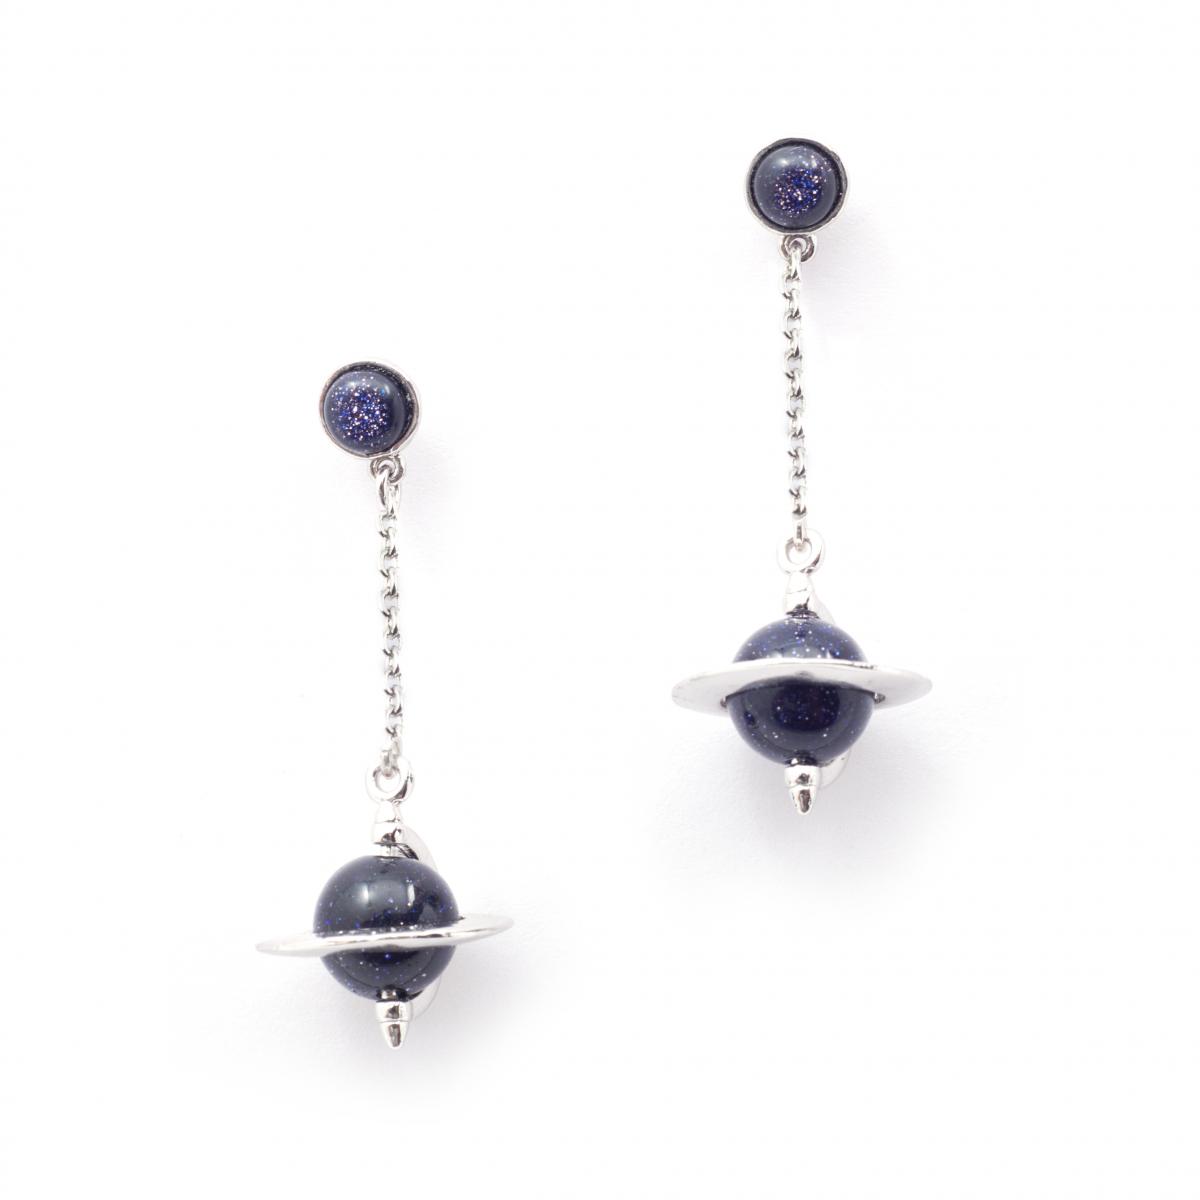 Astro Micro Orb Bar Earrings Fashion Jewellery